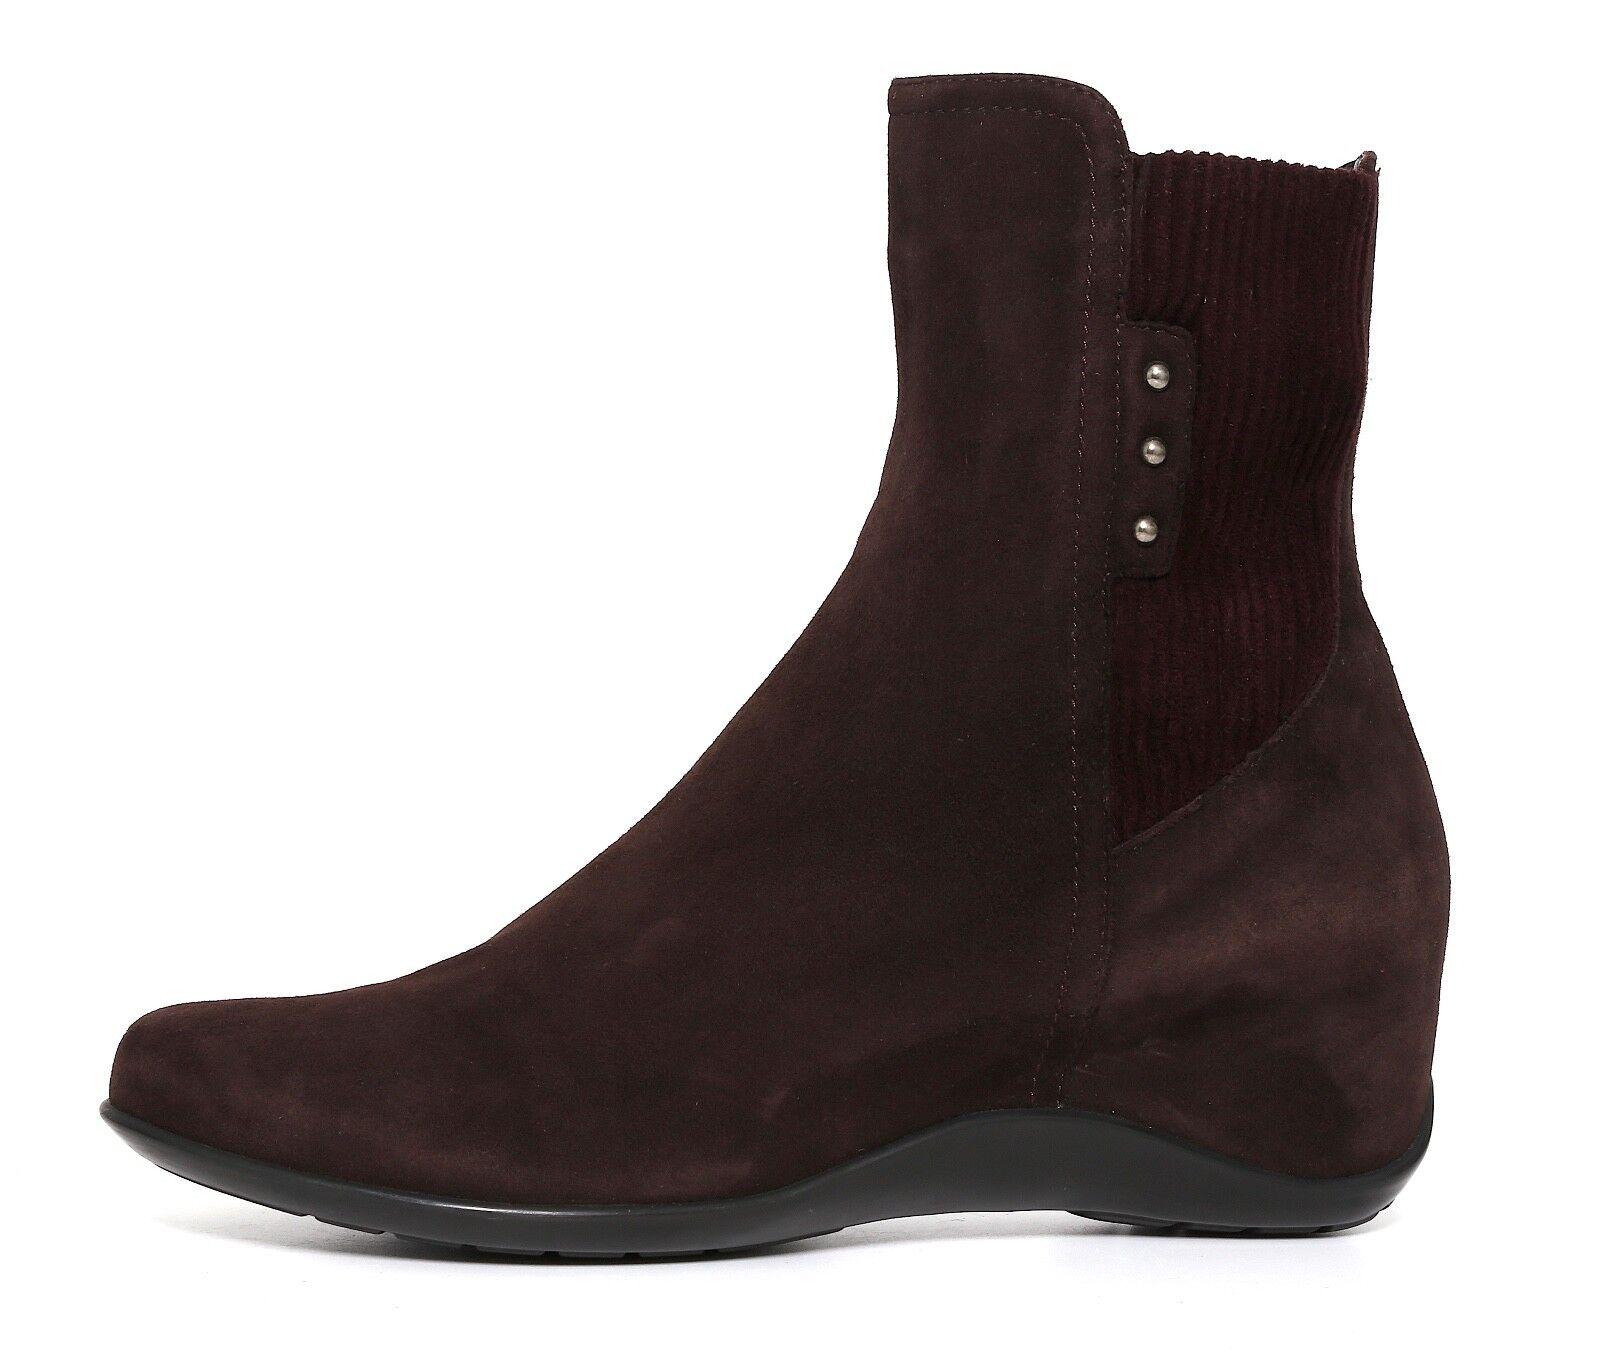 Aquatalia Versus Suede Wedge Ankle Boot Brown Donna Sz 7 6642 *